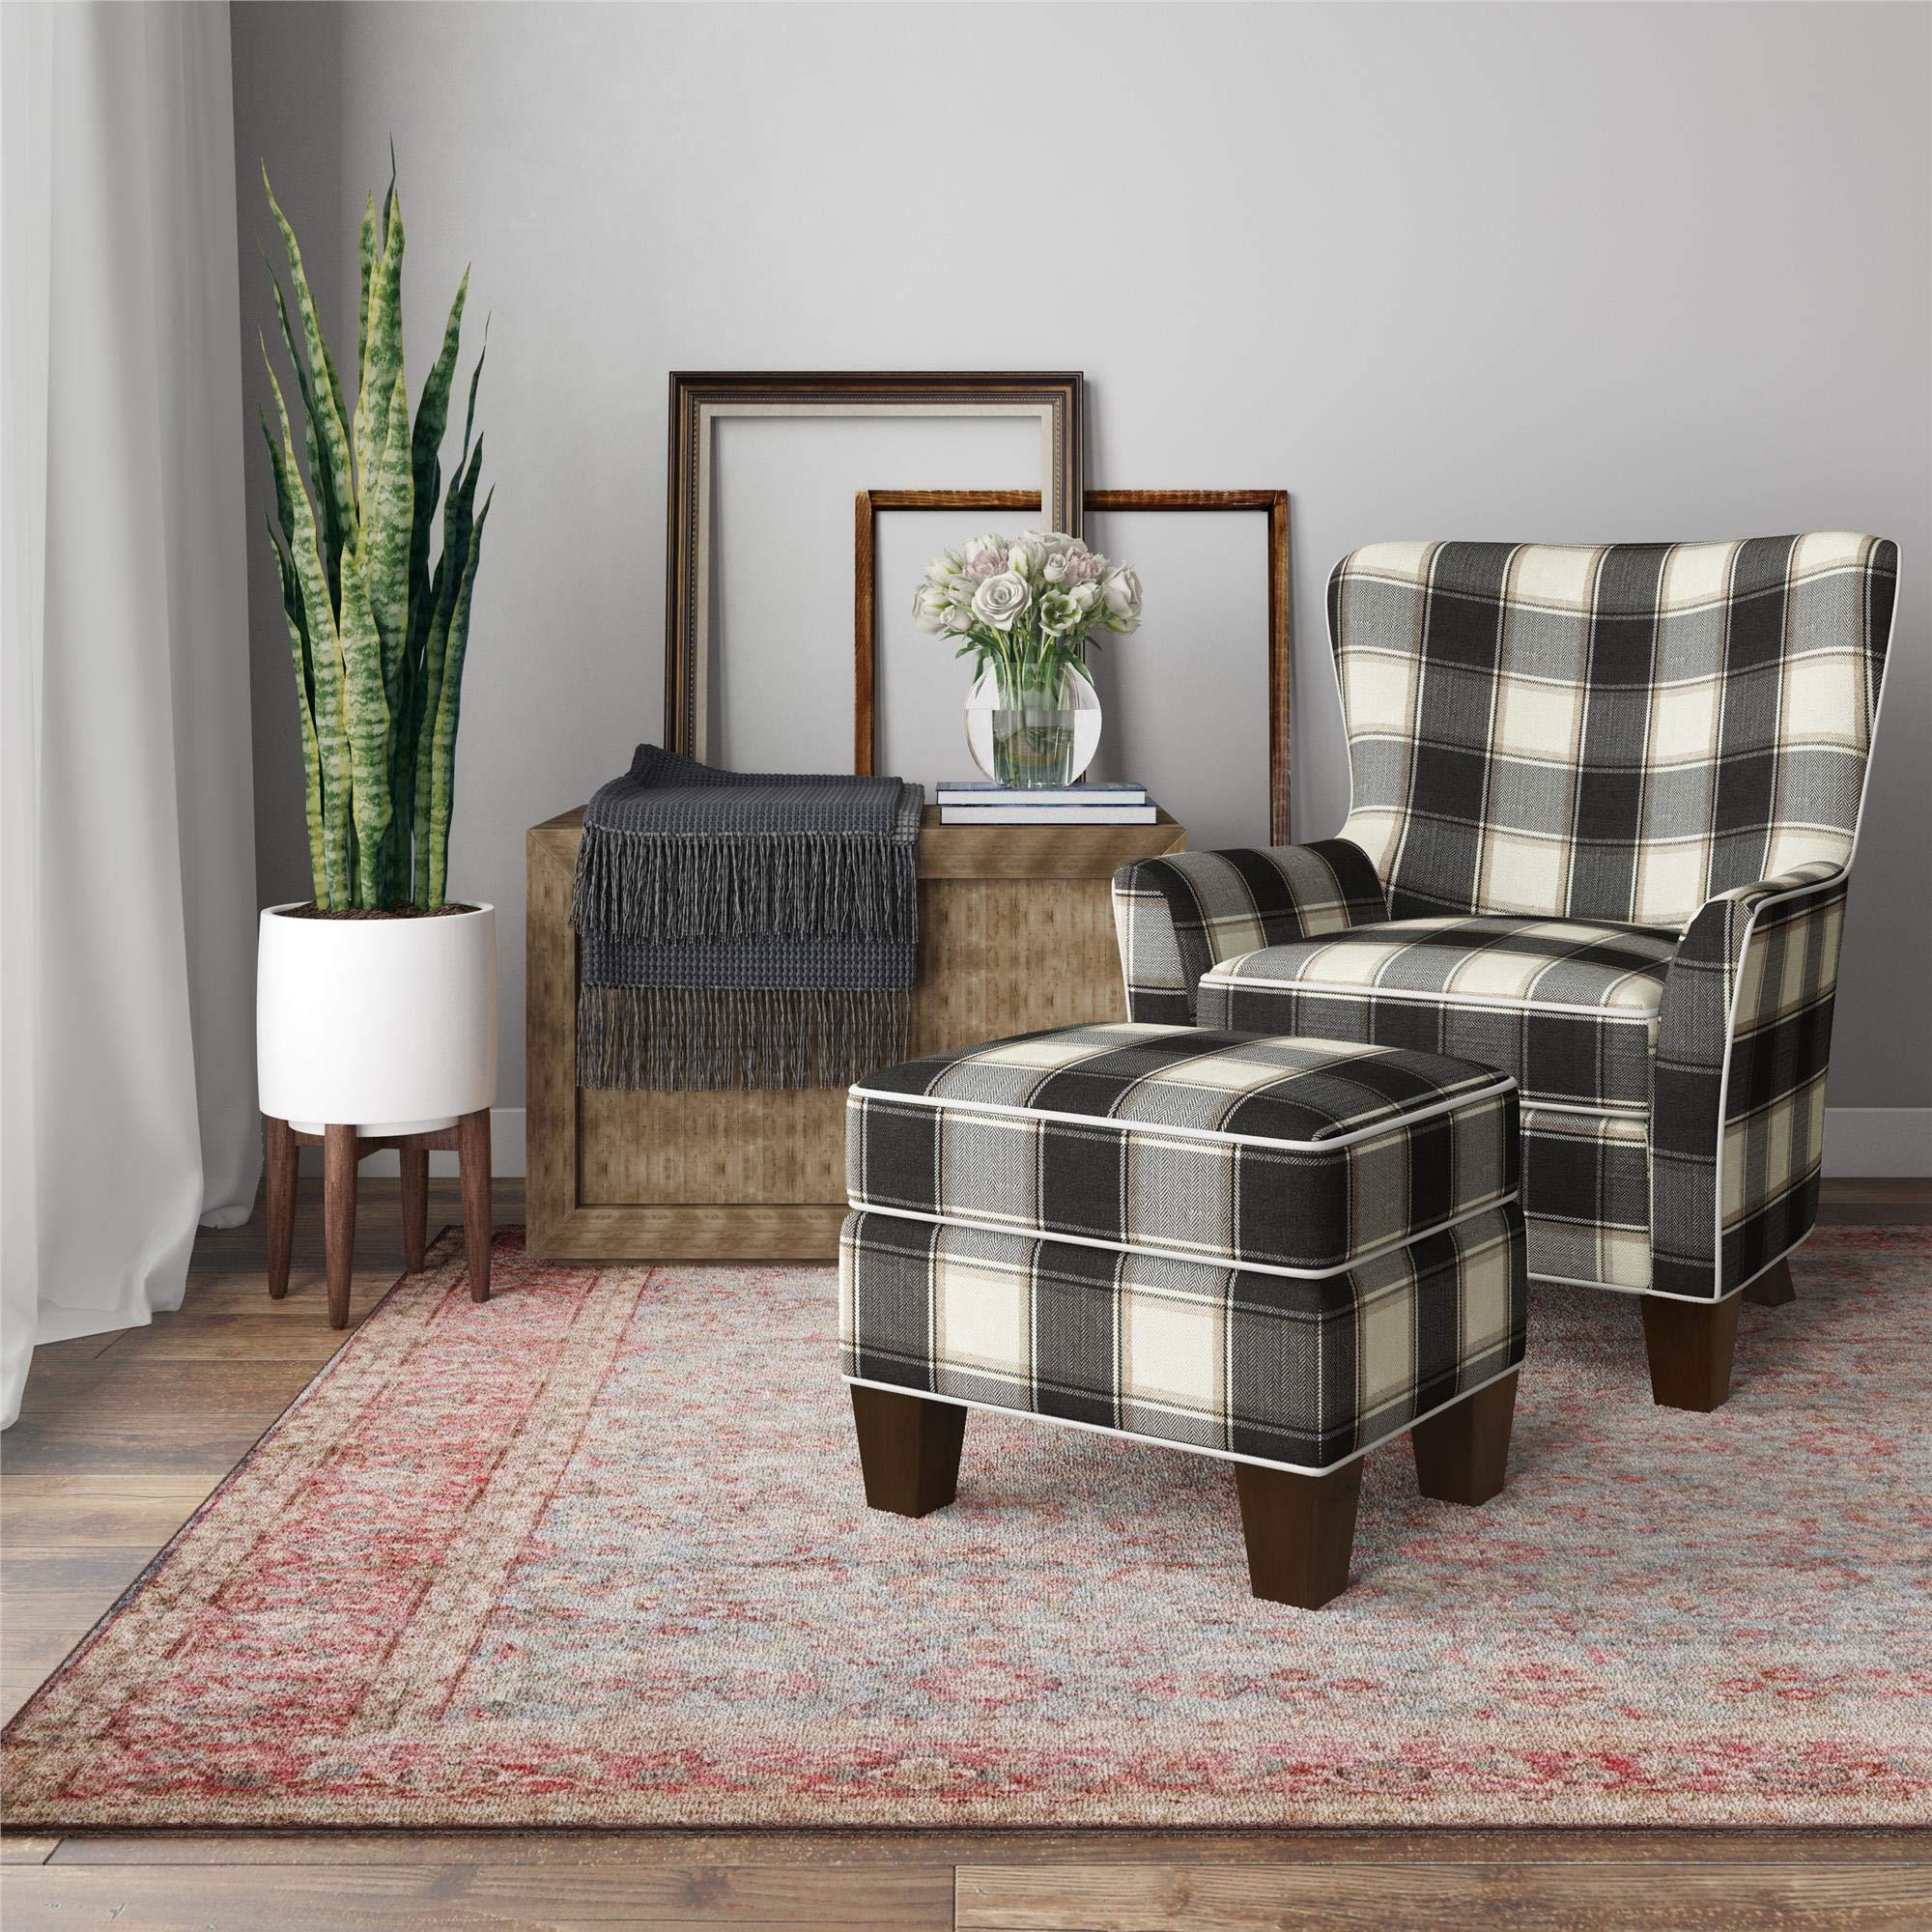 Dorel Living Berkeley Chair & Ottoman Set, Black Plaid Accent Chair by Dorel Living